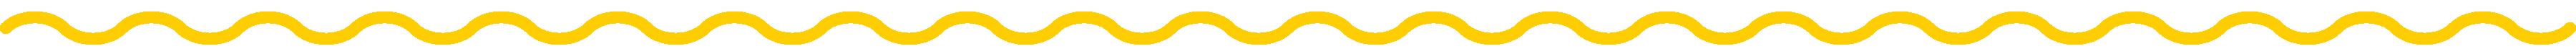 MFM Bar Squiggle Yellow